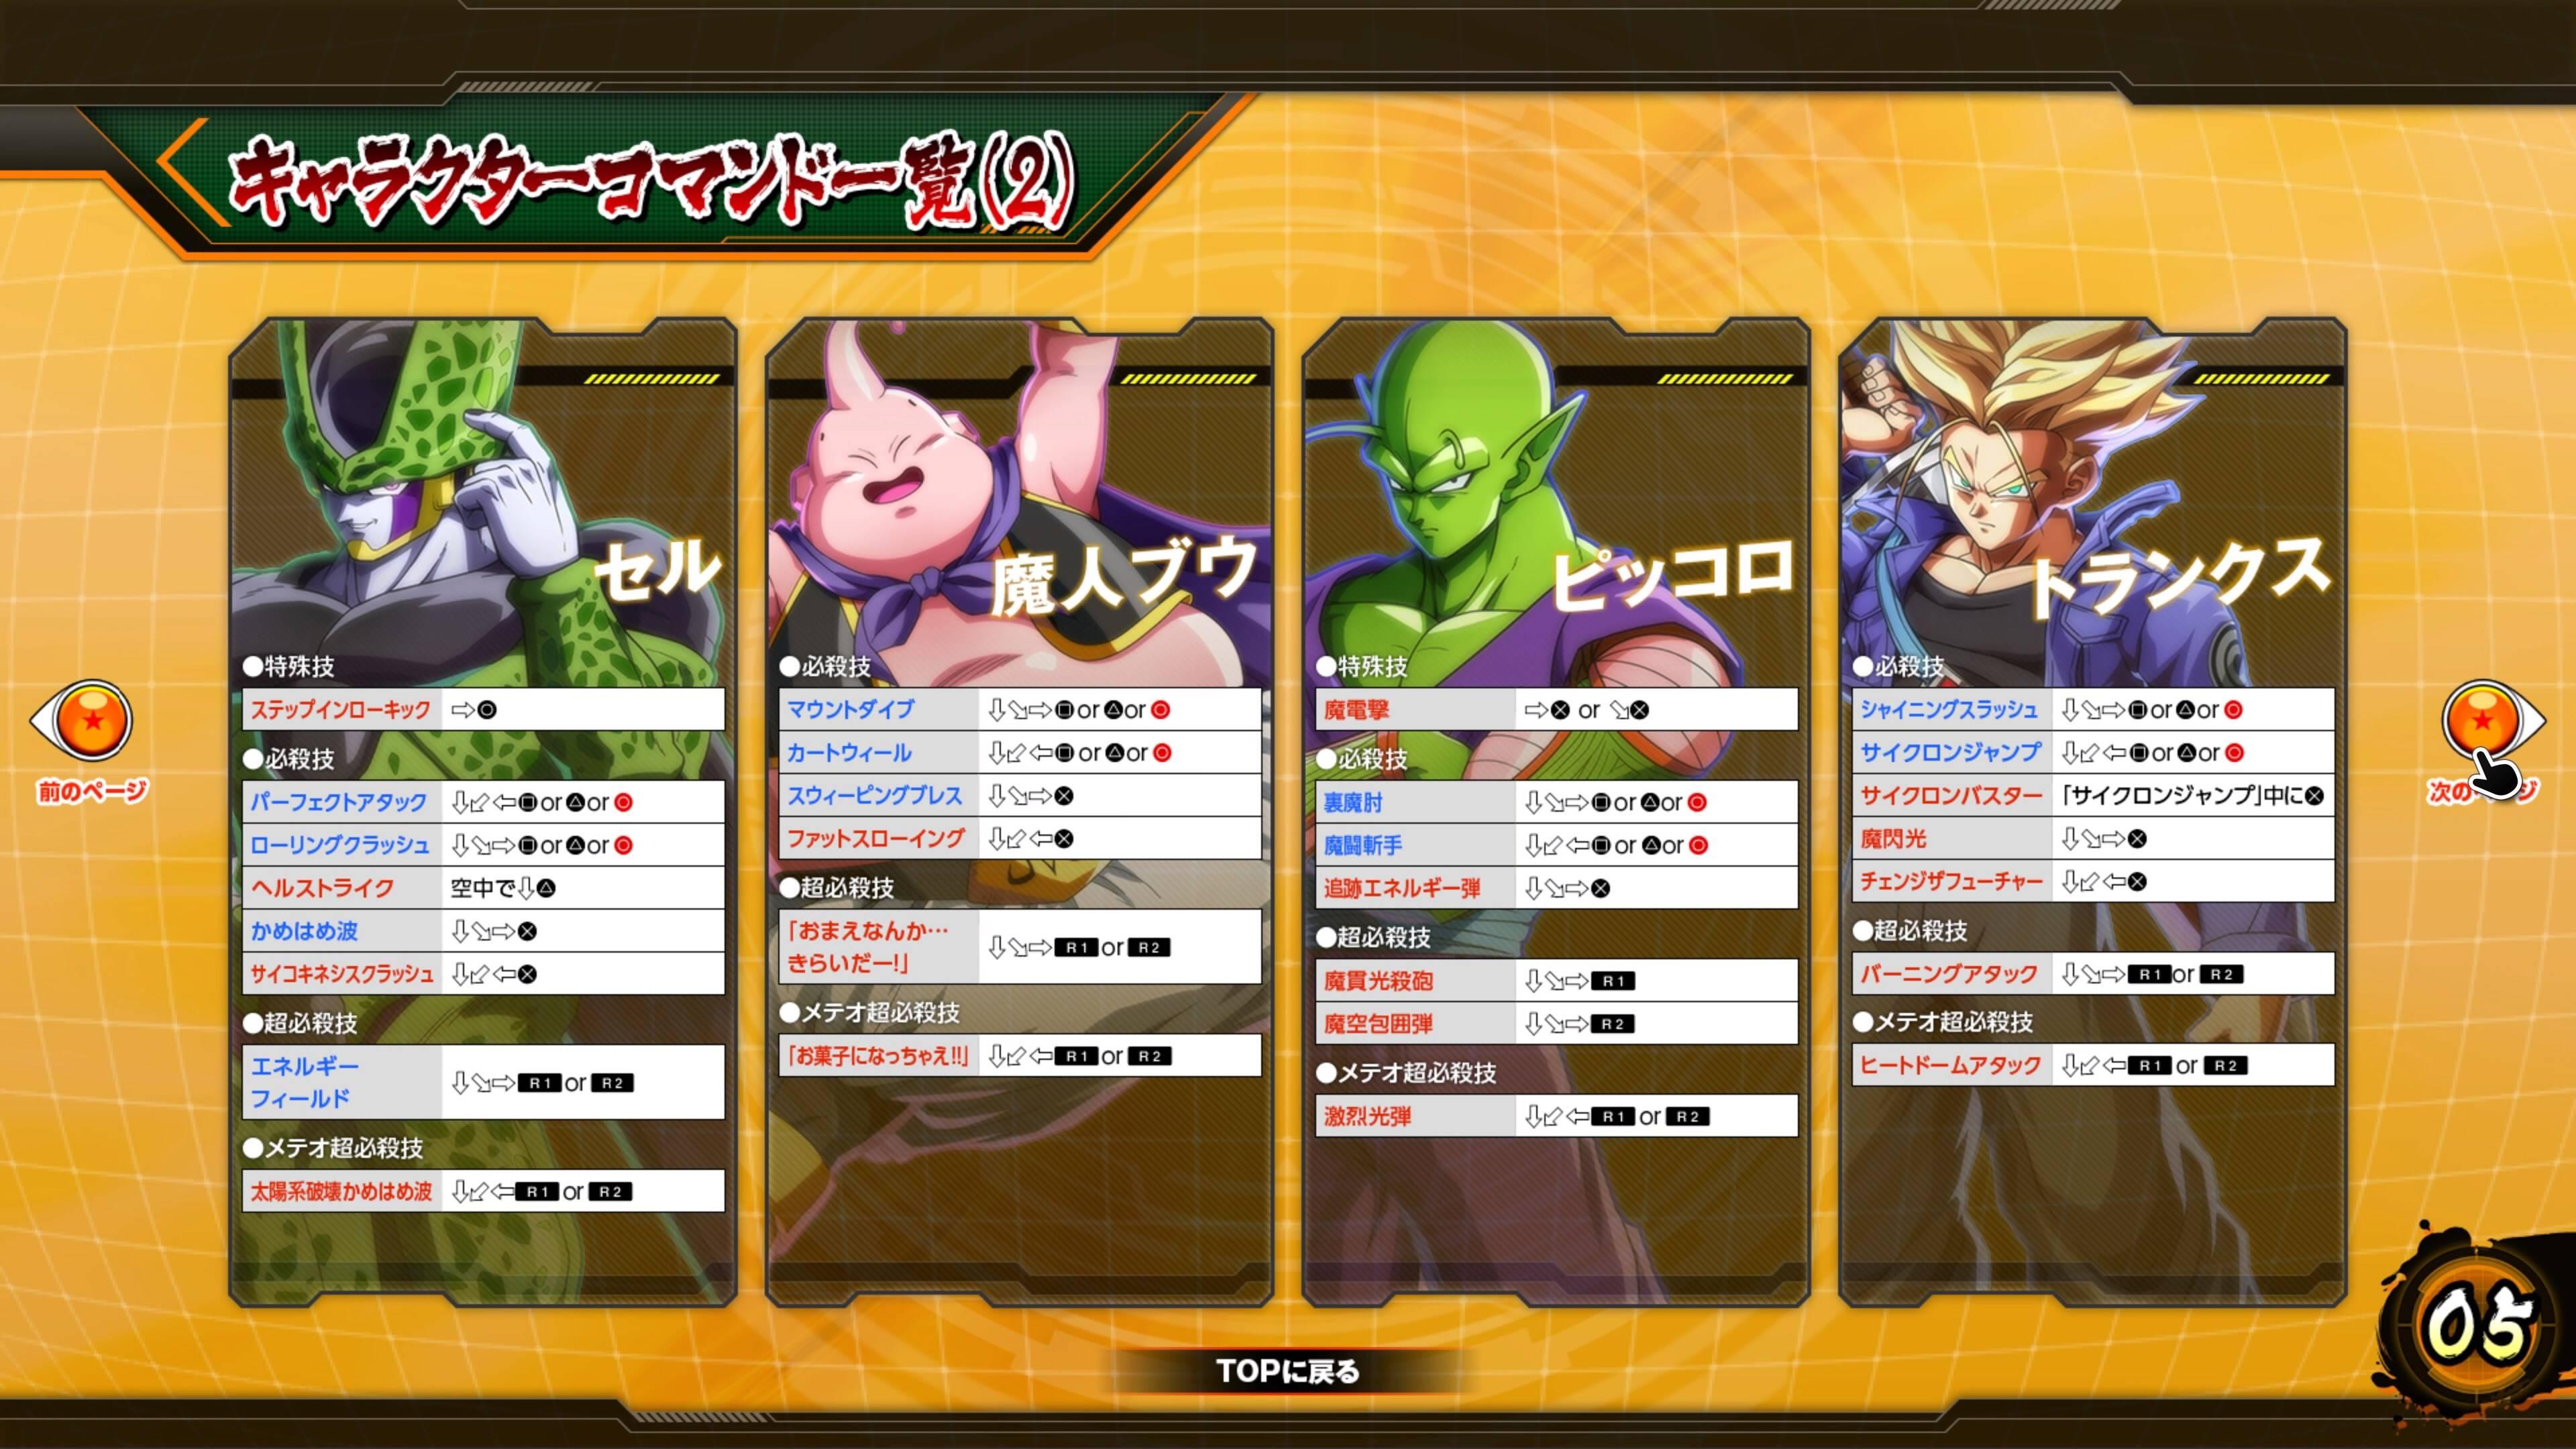 2RPc9uaPnKezX - 【朗報】ドラゴンボールの格ゲー、波動拳と竜巻旋風脚さえできれば初心者でも楽しめる格闘ゲームに仕上がる